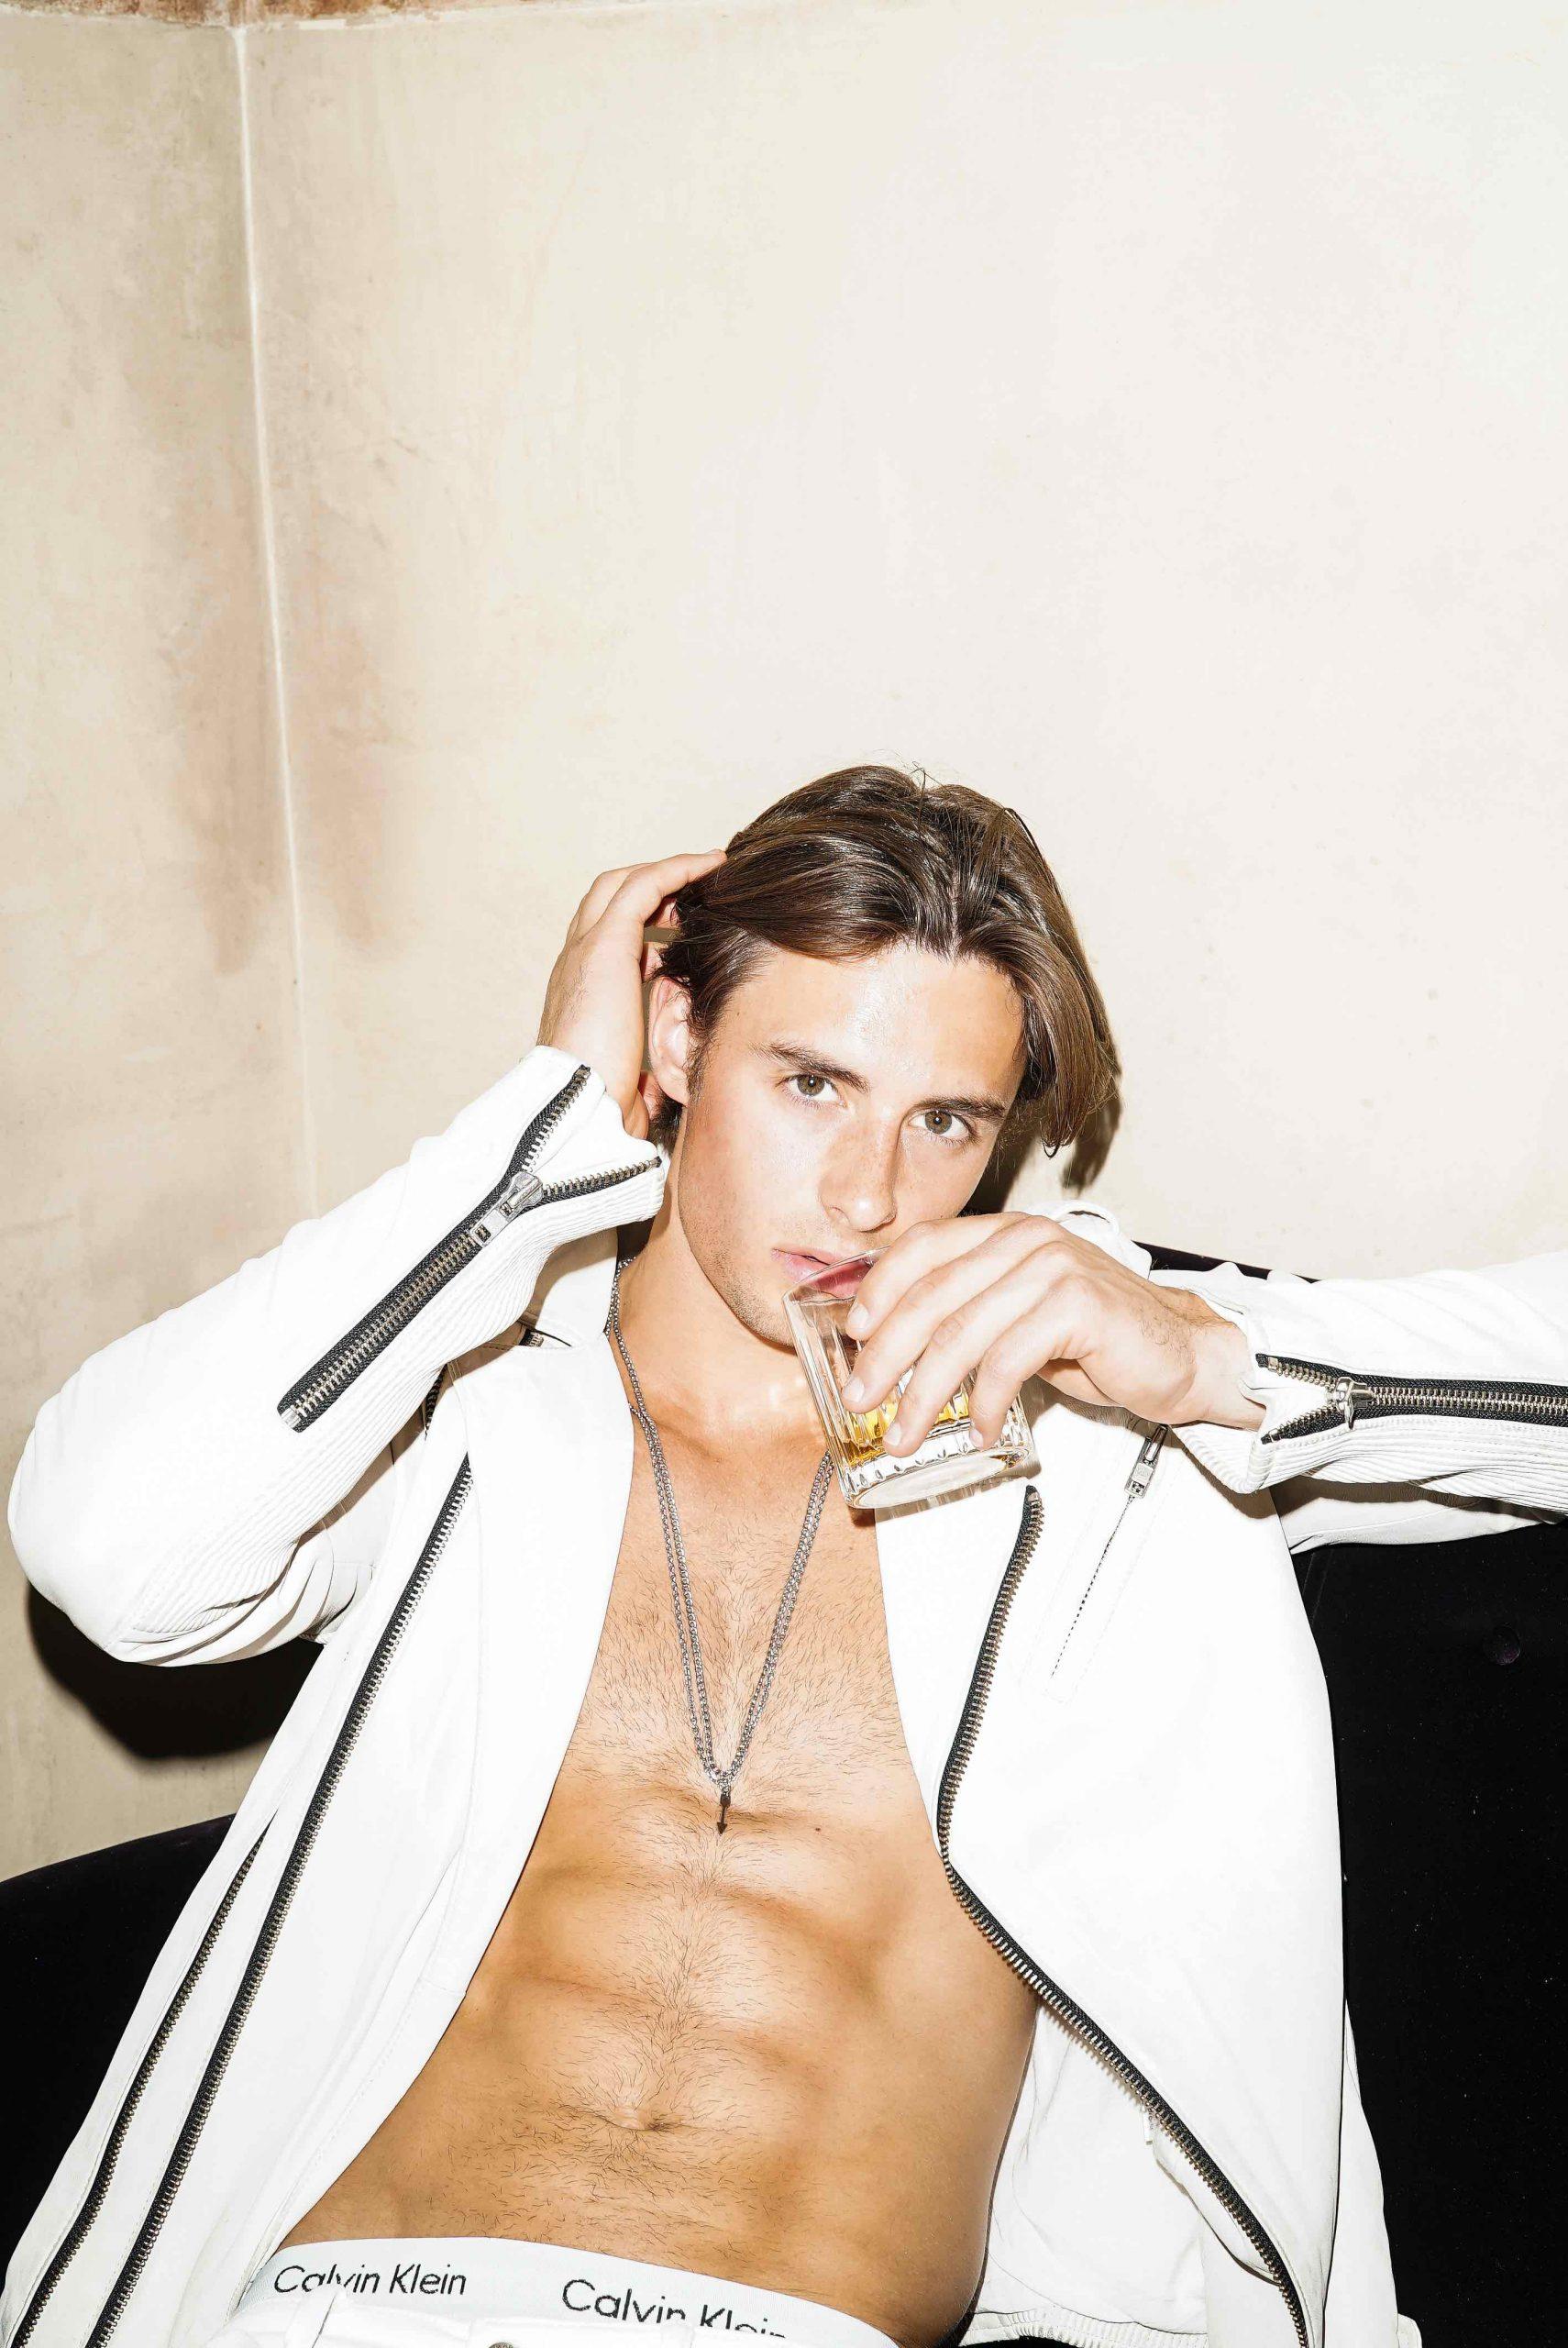 Fabian Arnold by Ron Flieger Fabian Arnold by Ron Flieger Vanity Teen Menswear & new faces magazine